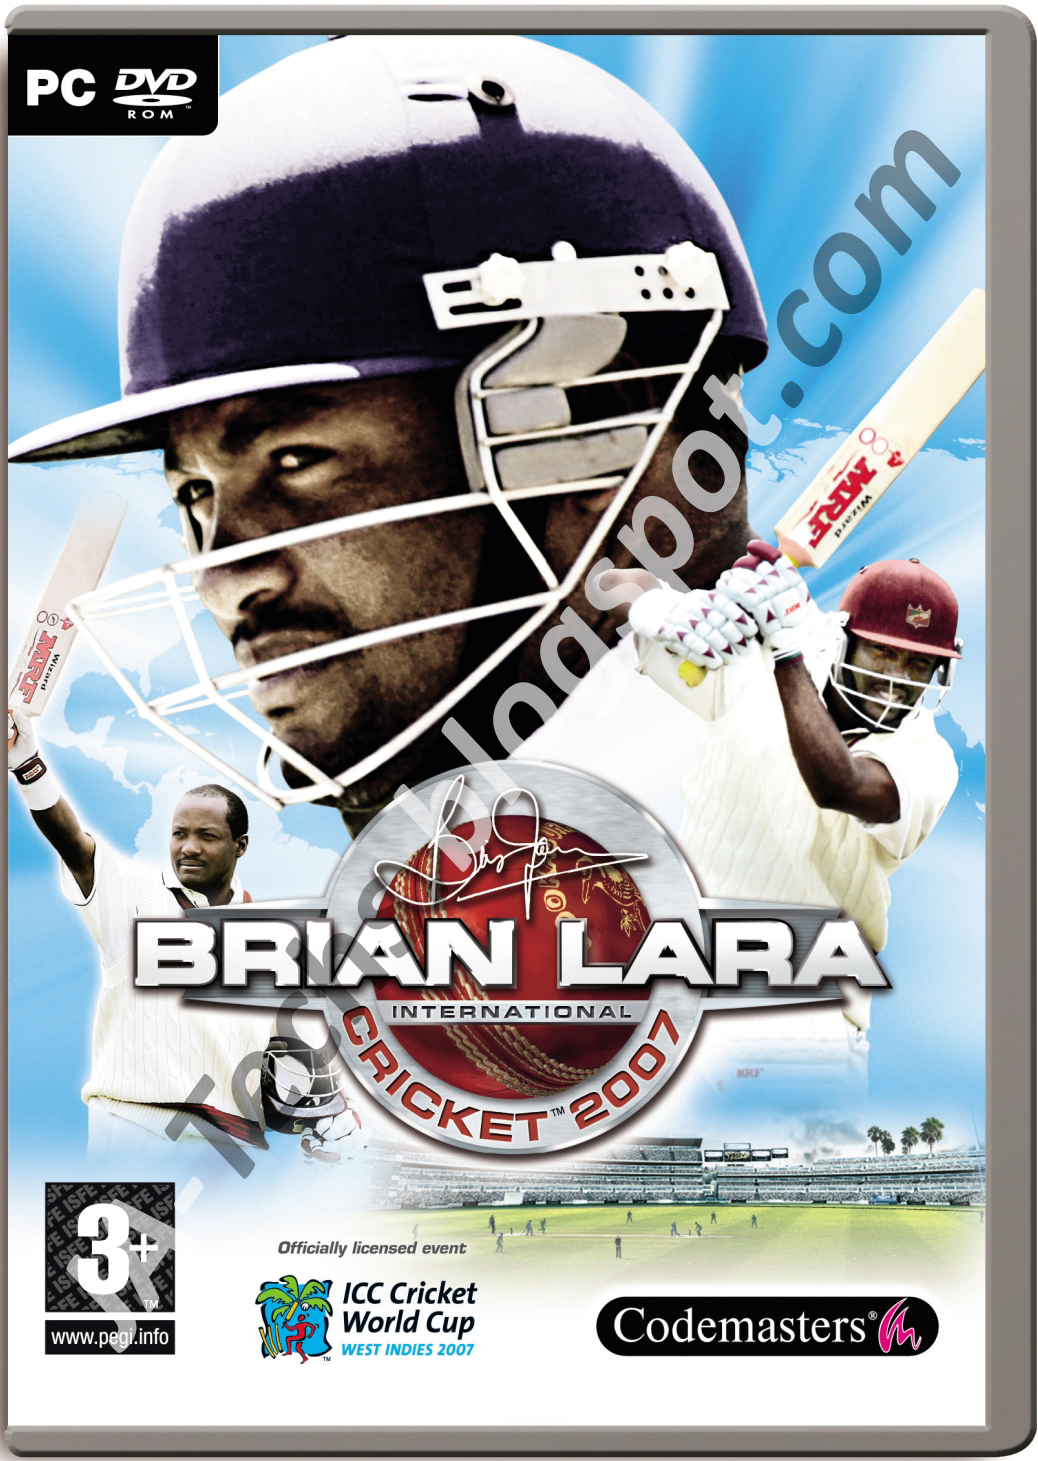 How to install brian lara international cricket 2007 in pc! 100.